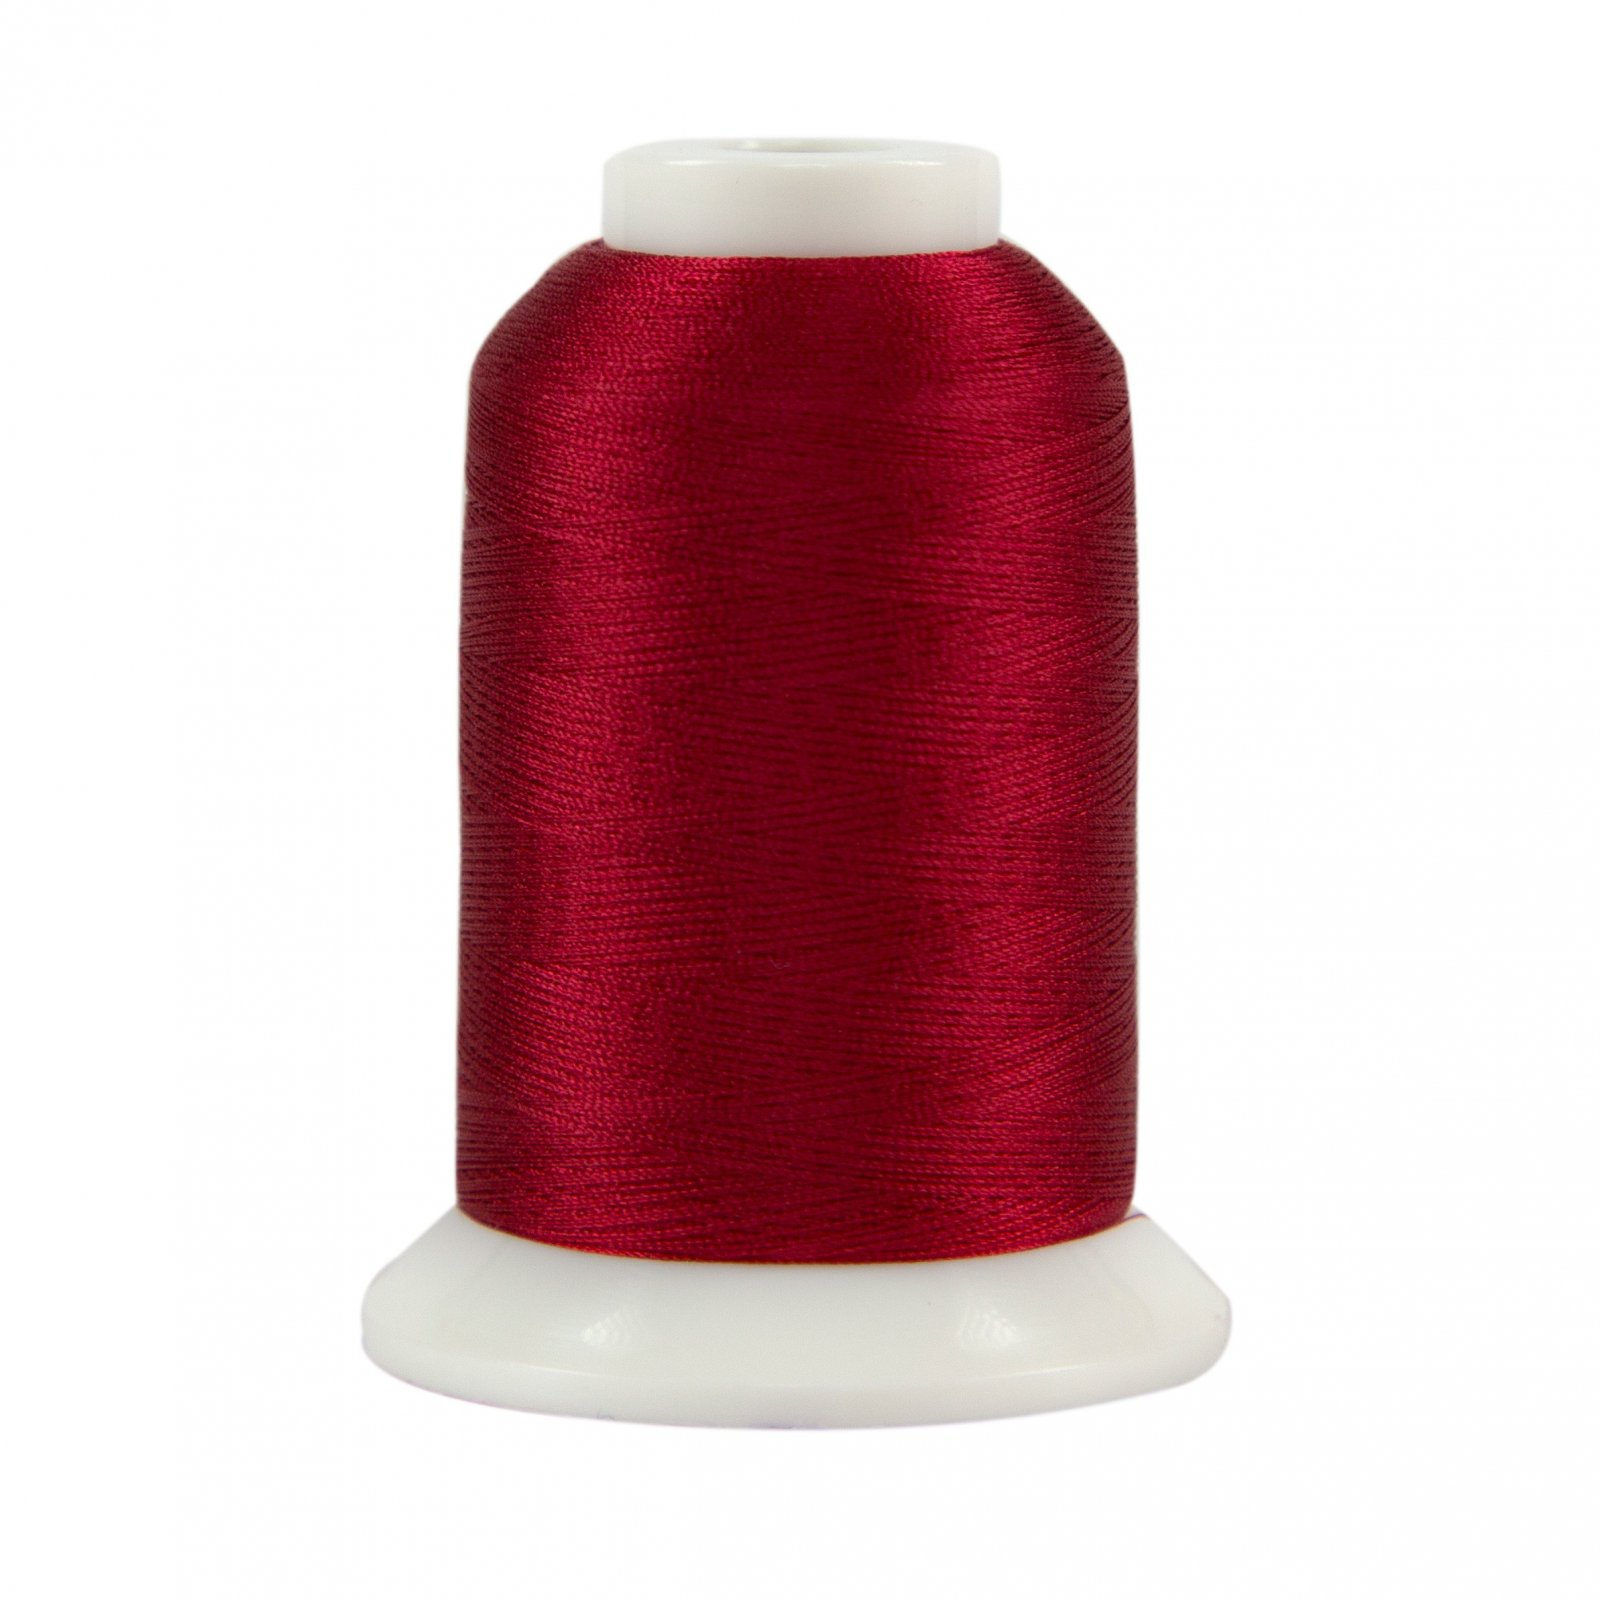 Kimono Silk Thread 100wt 1090yd Hezza